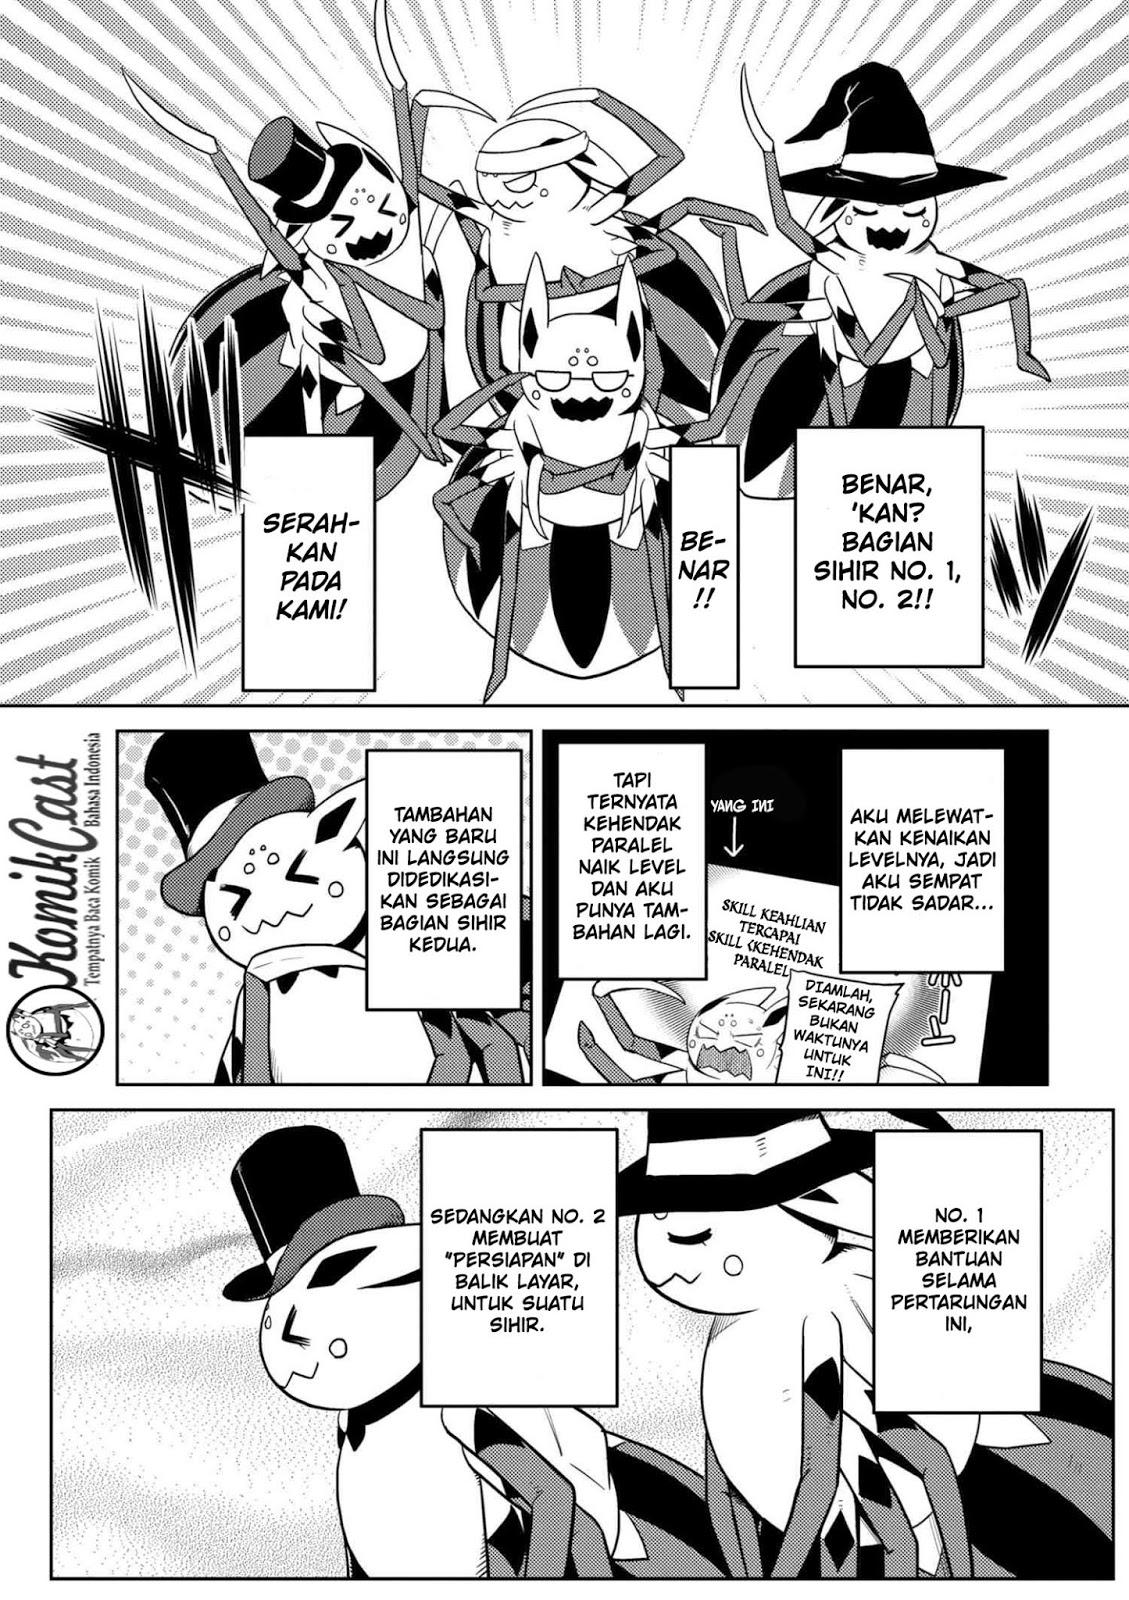 Komik kumo desu ga nani ka 025.2 - chapter 25.2 26.2 Indonesia kumo desu ga nani ka 025.2 - chapter 25.2 Terbaru 13|Baca Manga Komik Indonesia